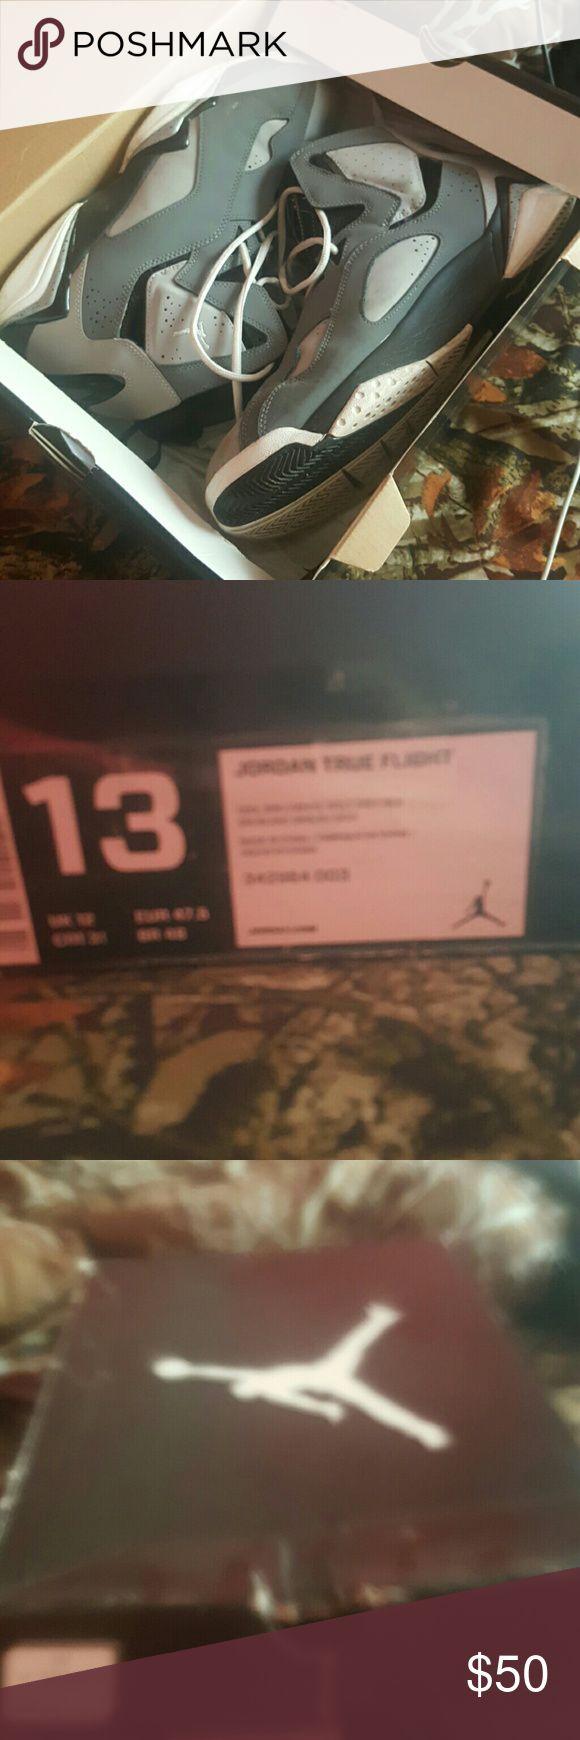 Size 13 jordan True flights Grey and white jordans Jordan Shoes Sneakers